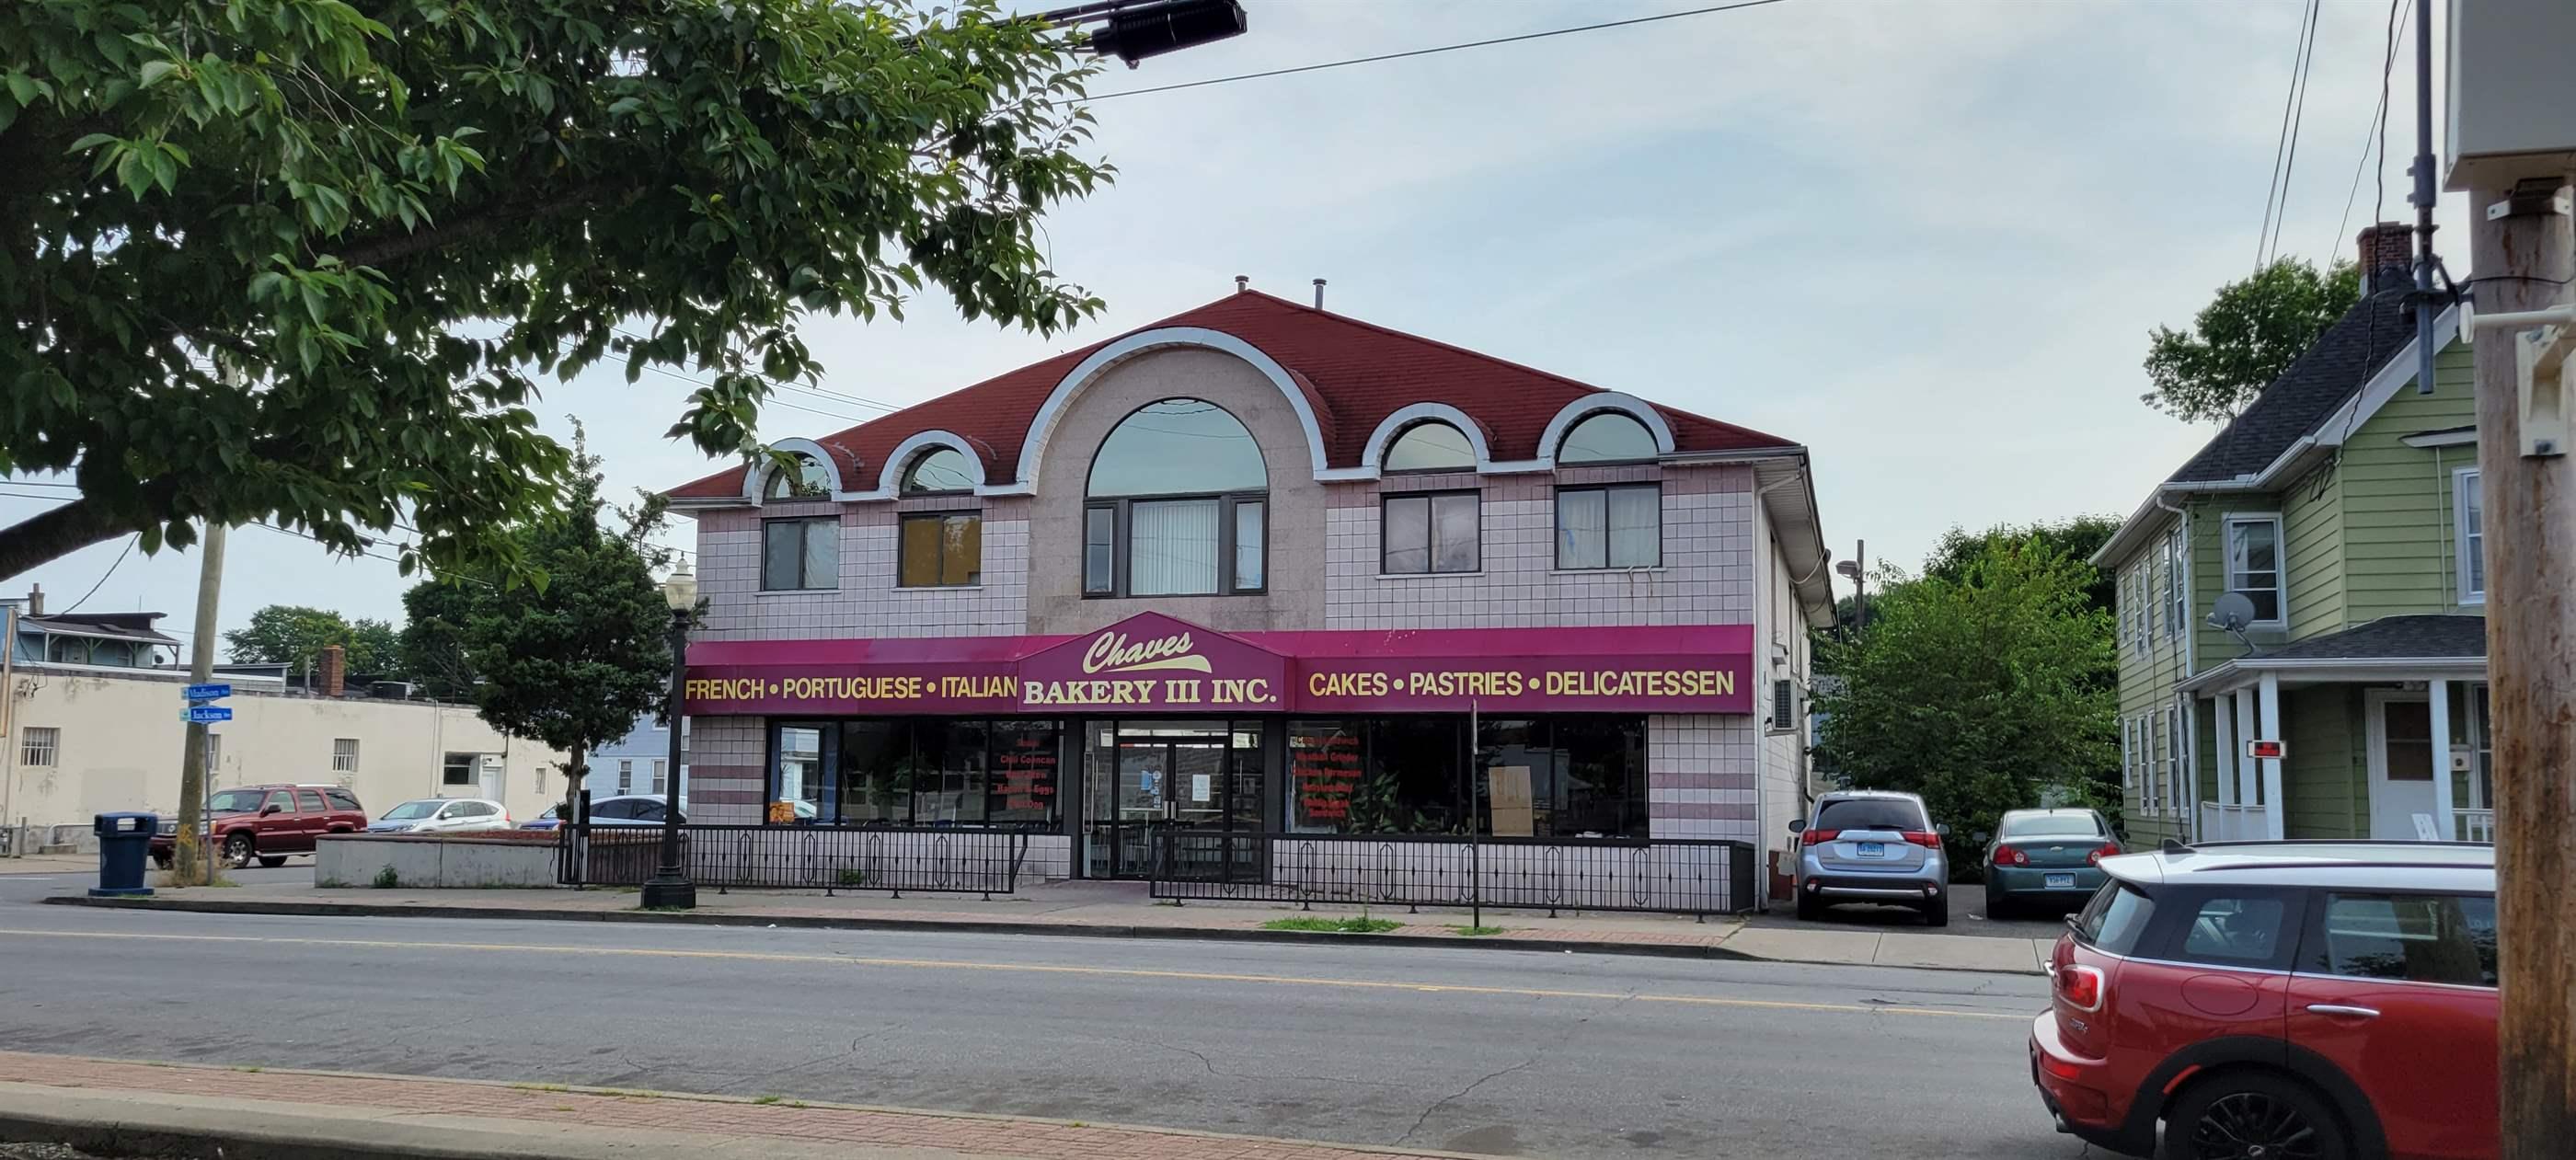 861 Madison Avenue, Bridgeport, CT 06606